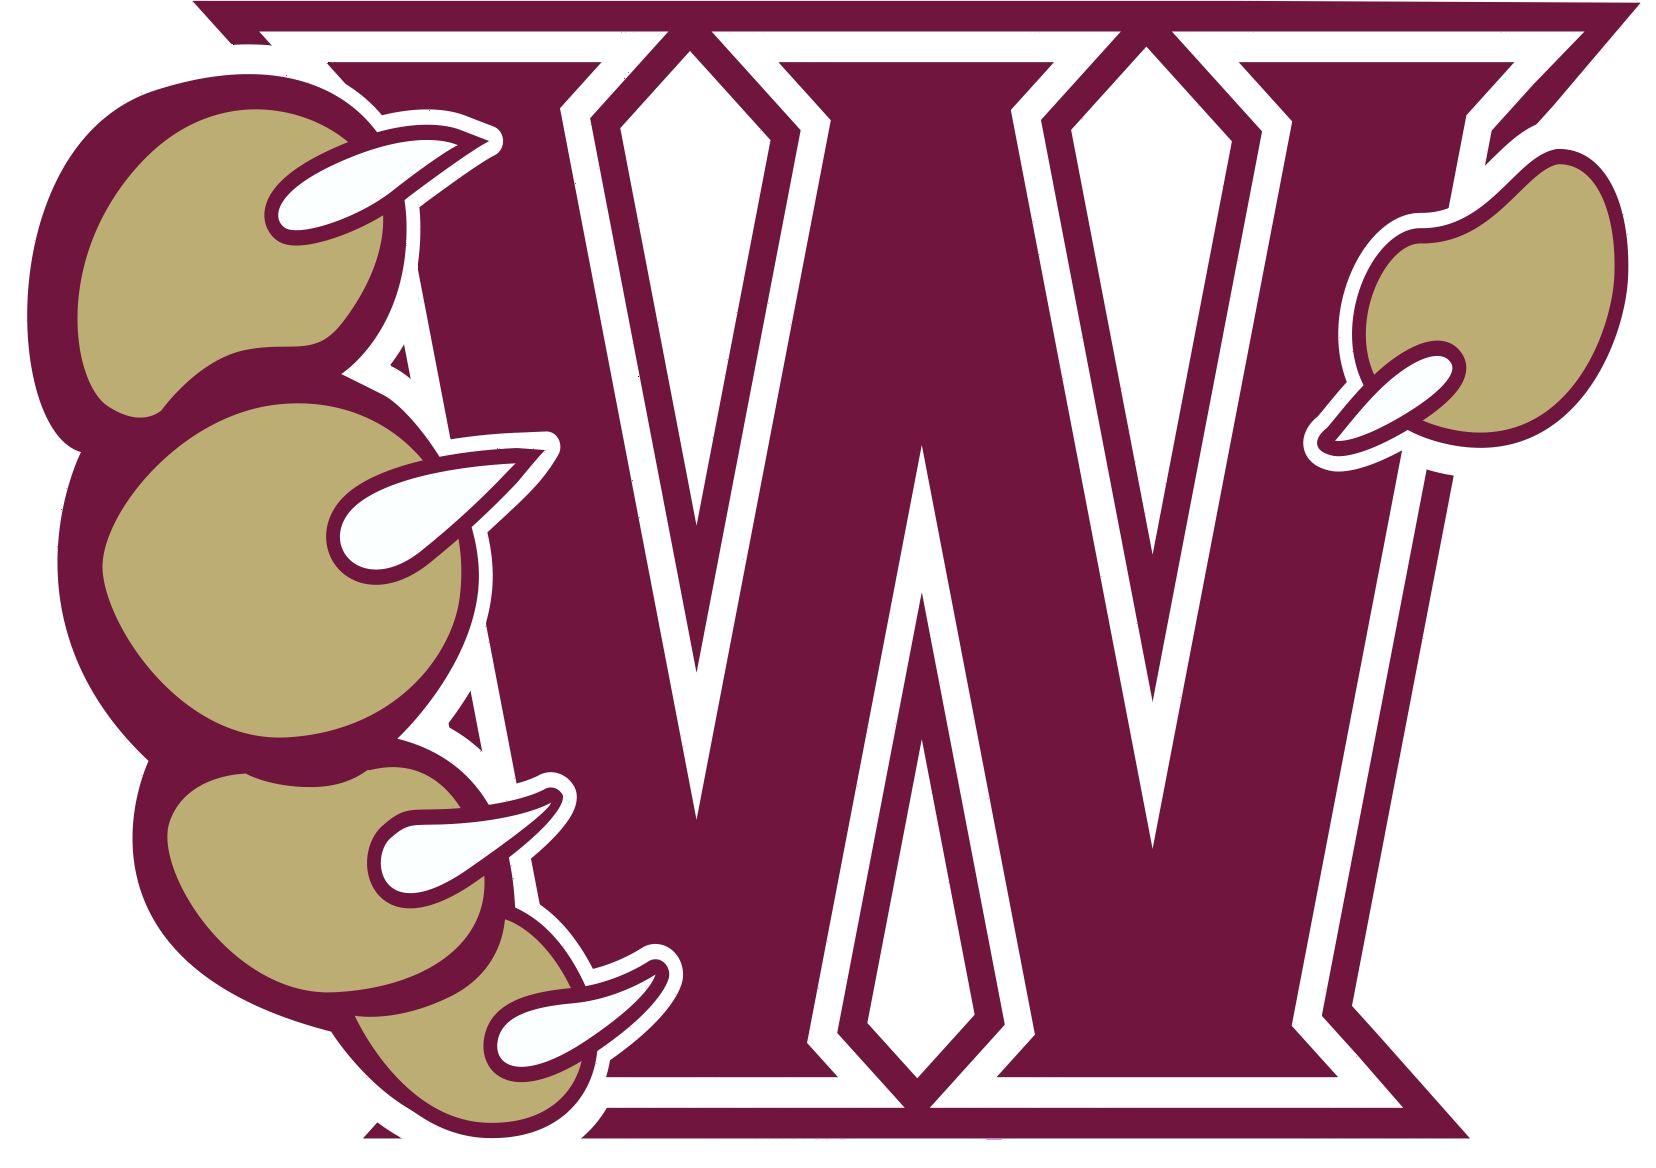 Heads up football whitney. Wildcat clipart wildcats arizona